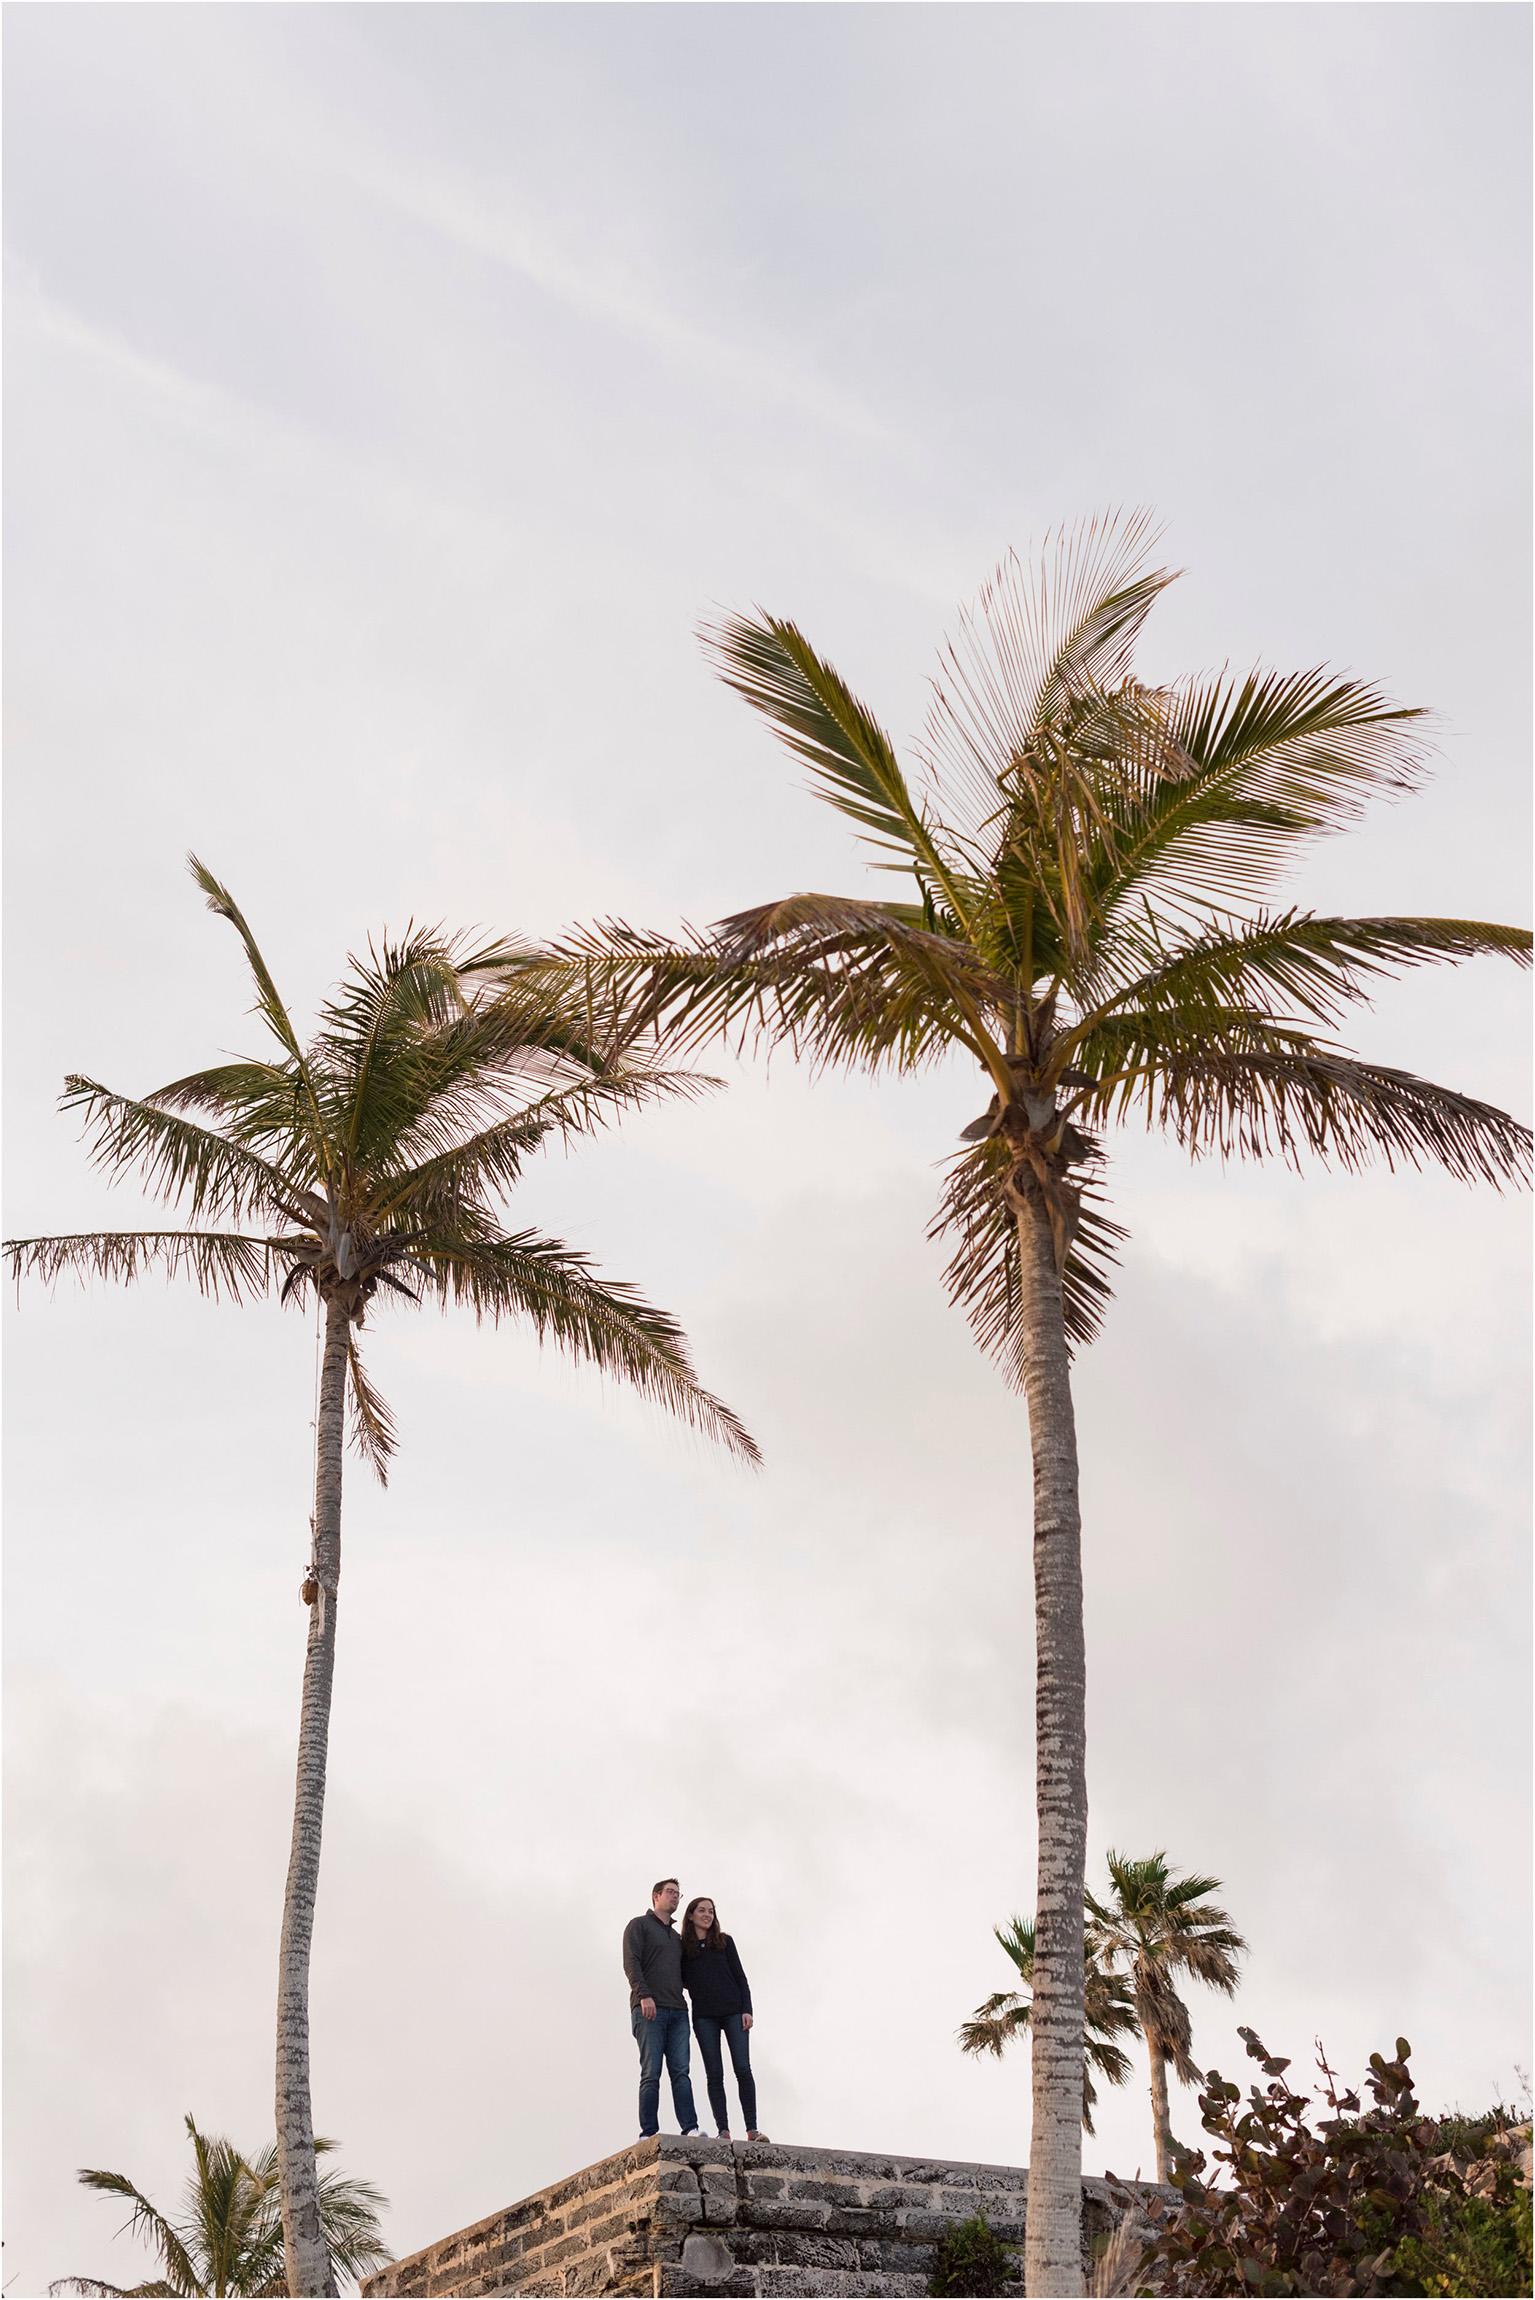 ©FianderFoto_Bermuda_Proposal_Mark_Sarah_012.jpg